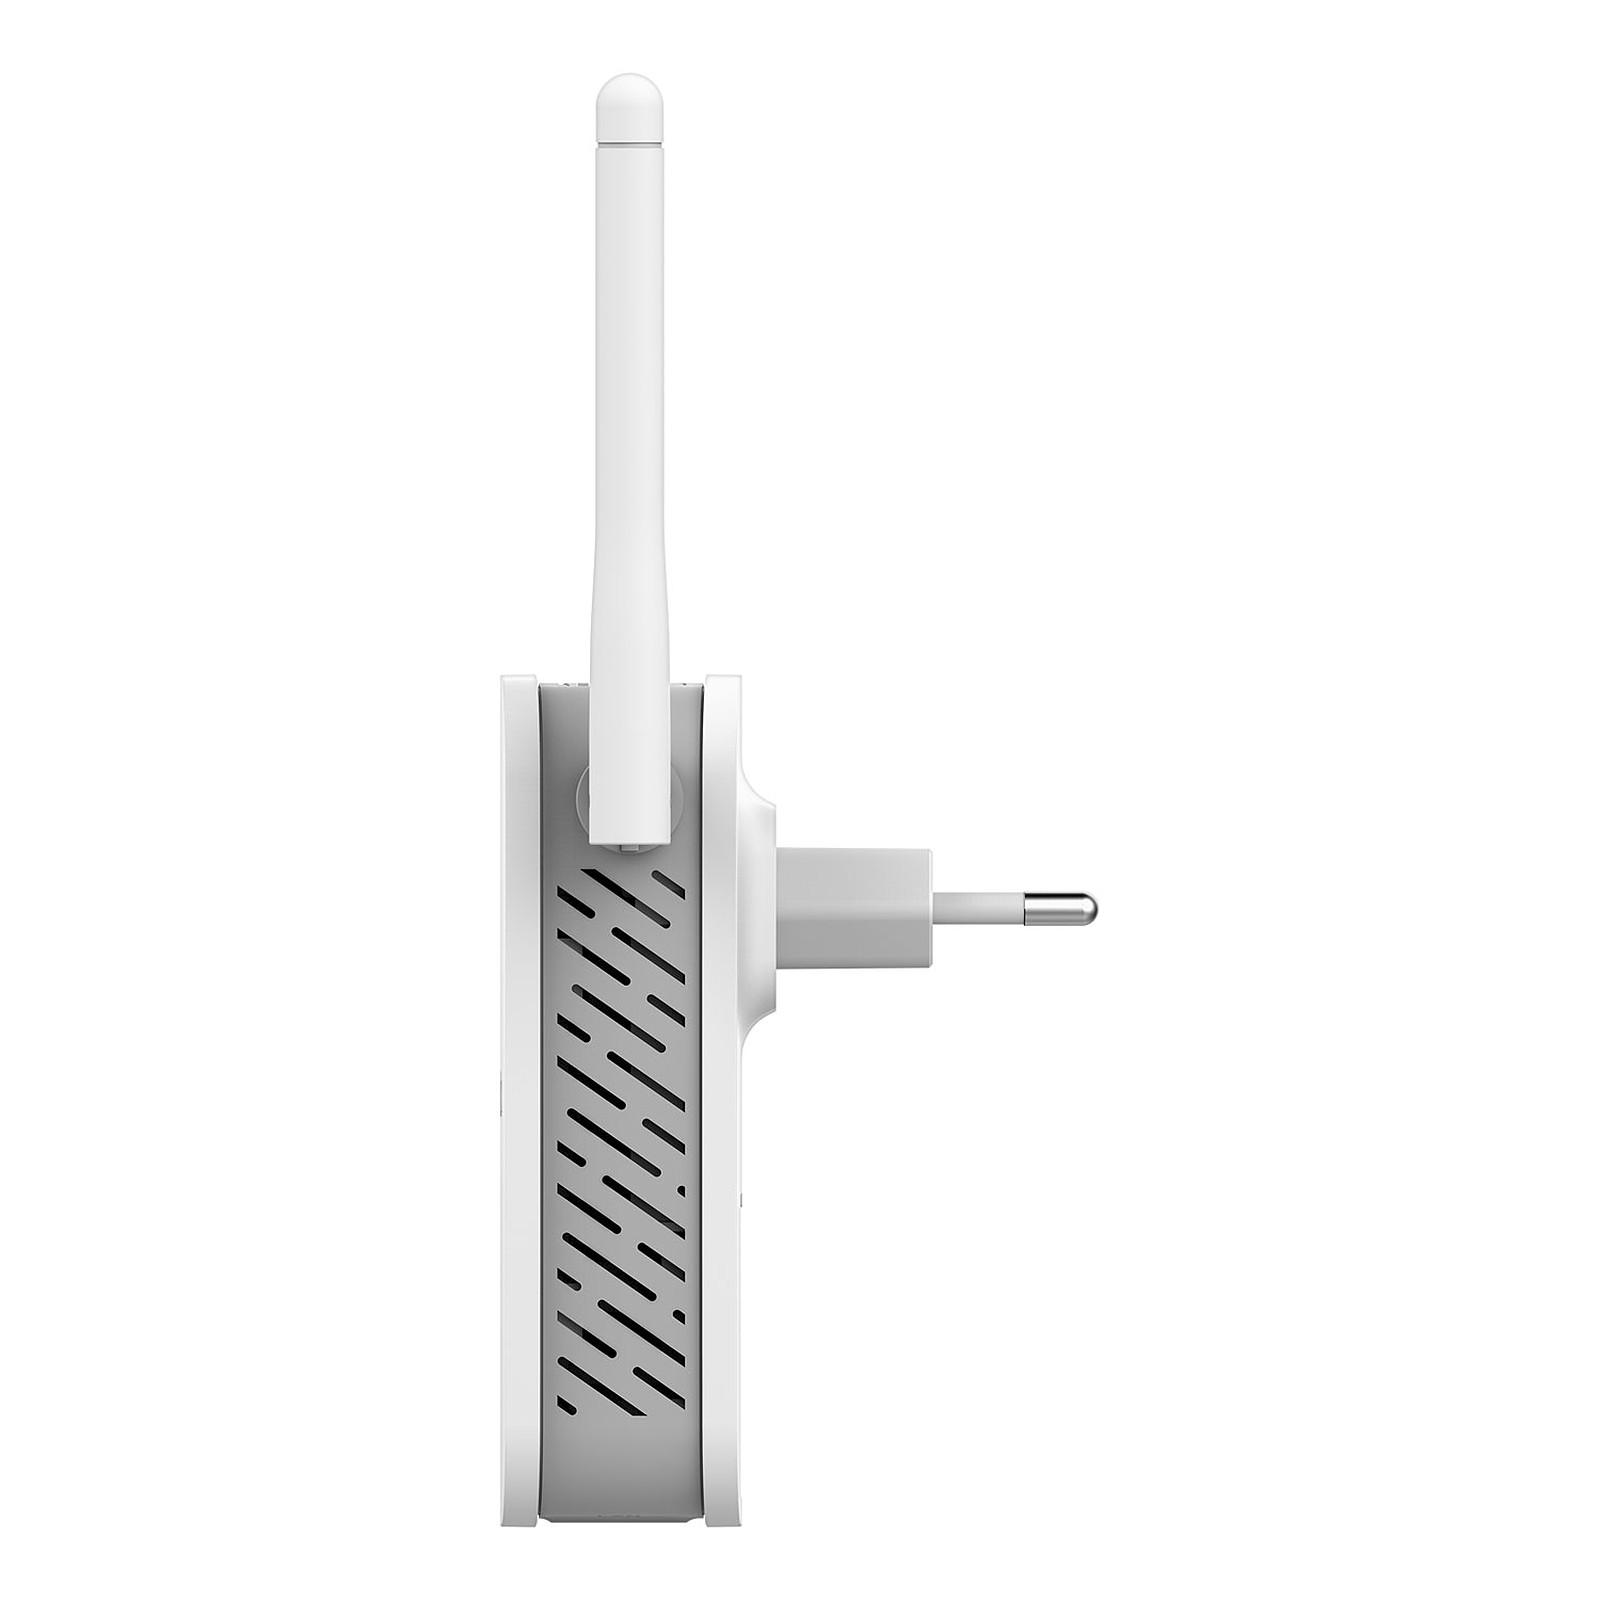 D-Link DAP-1325 - 802.11n 300 - Cybertek.fr - 2